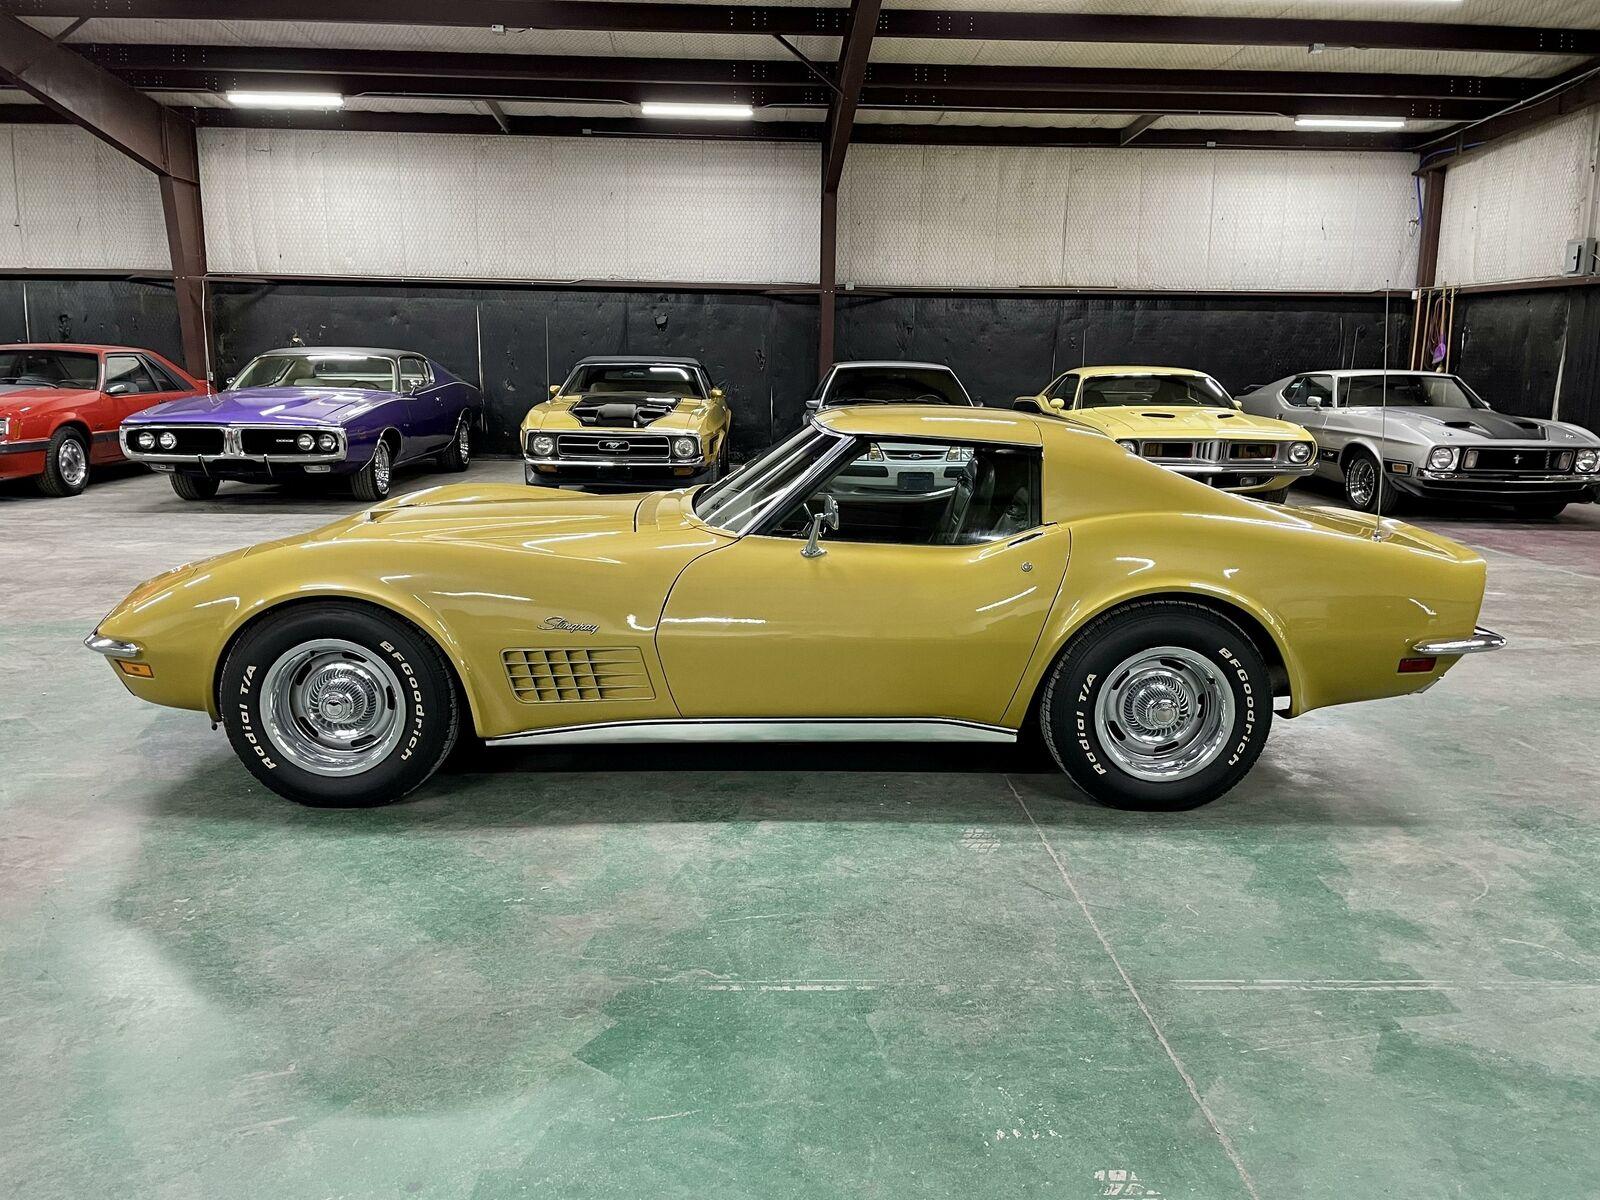 1972 Yellow Chevrolet Corvette   | C3 Corvette Photo 2